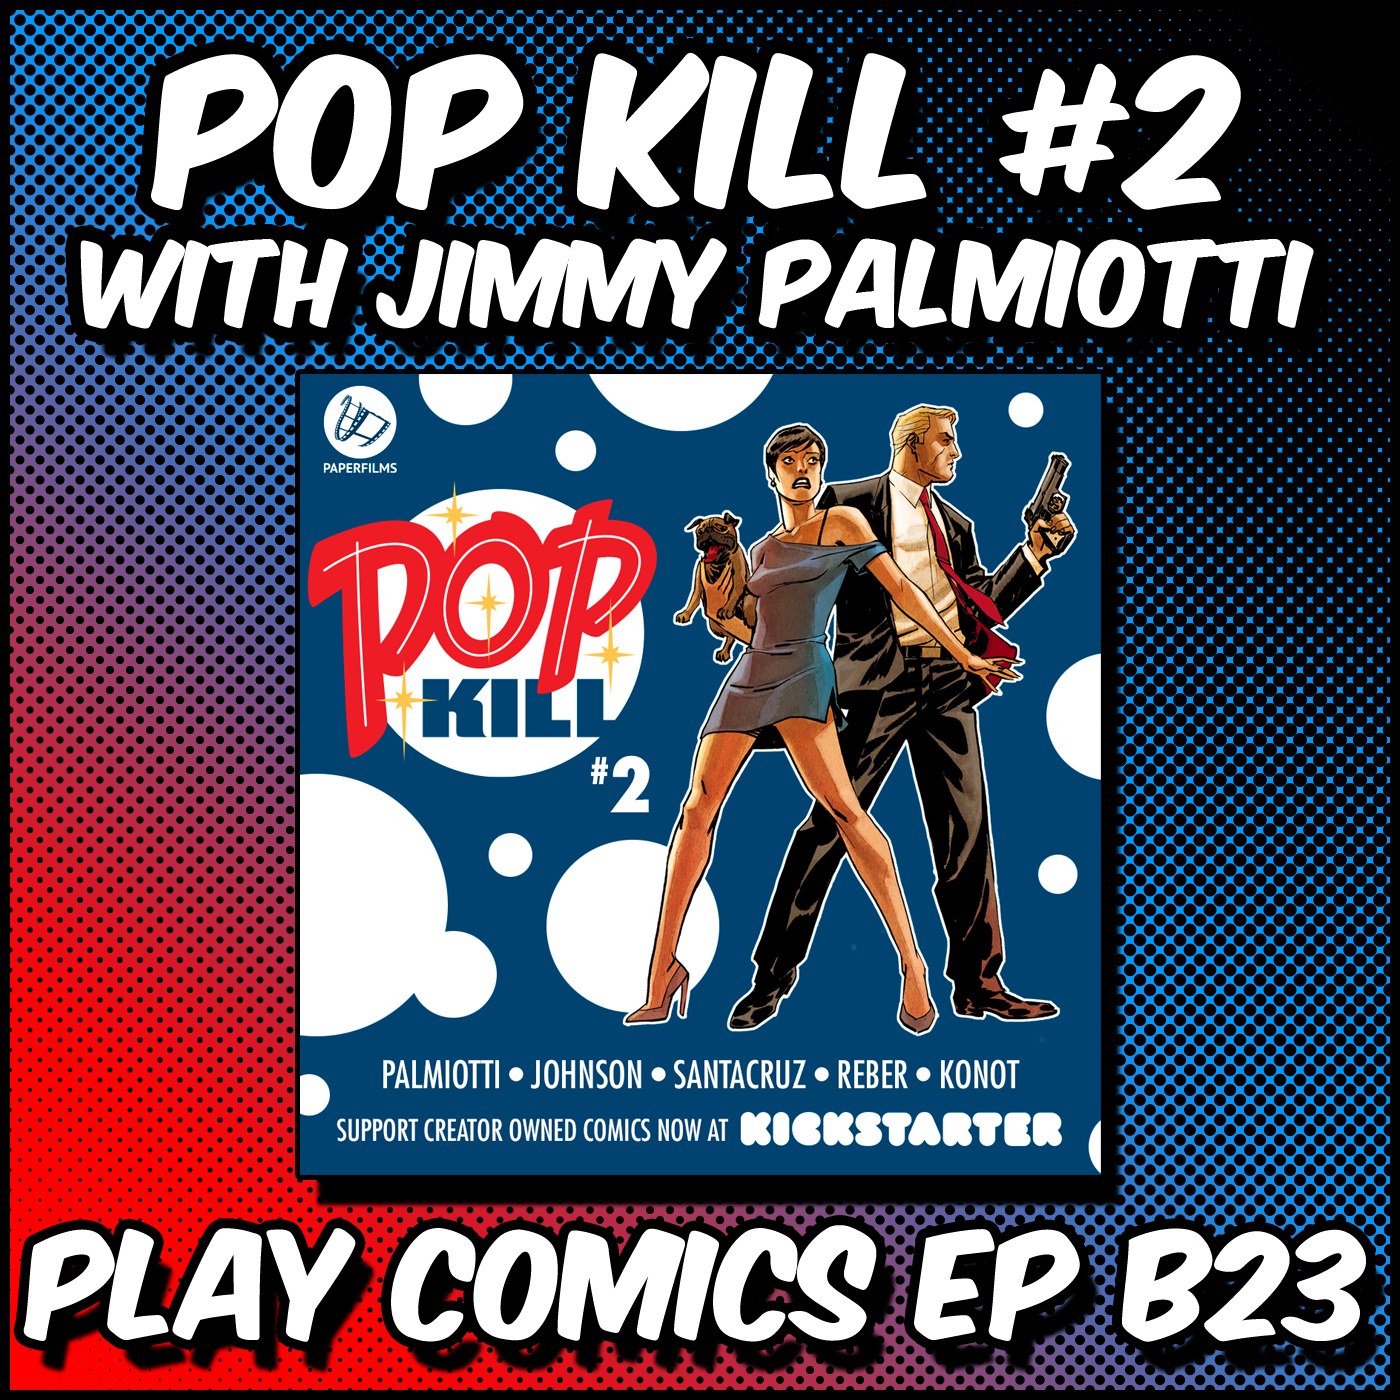 Pop Kill #2 With Jimmy Palmiotti